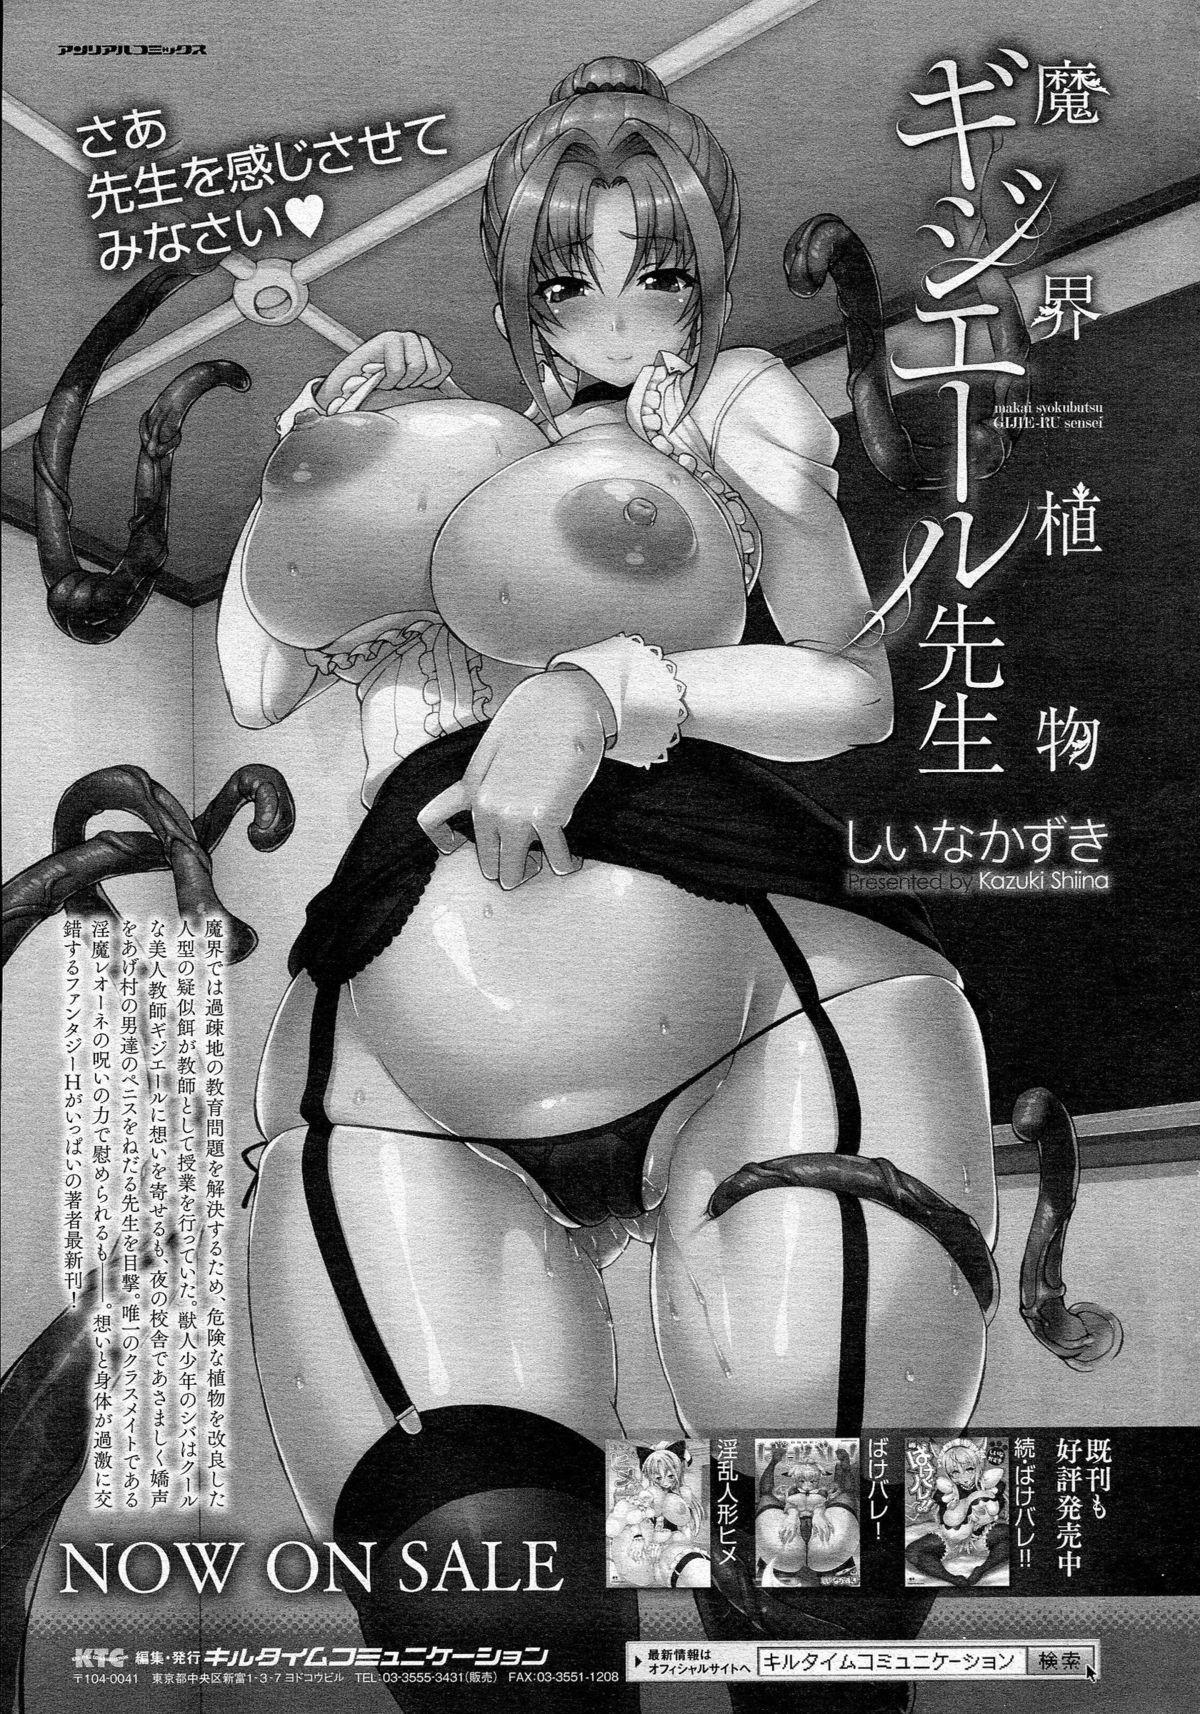 COMIC Unreal 2015-06 Vol. 55 + Hisasi Illust Shuu 153